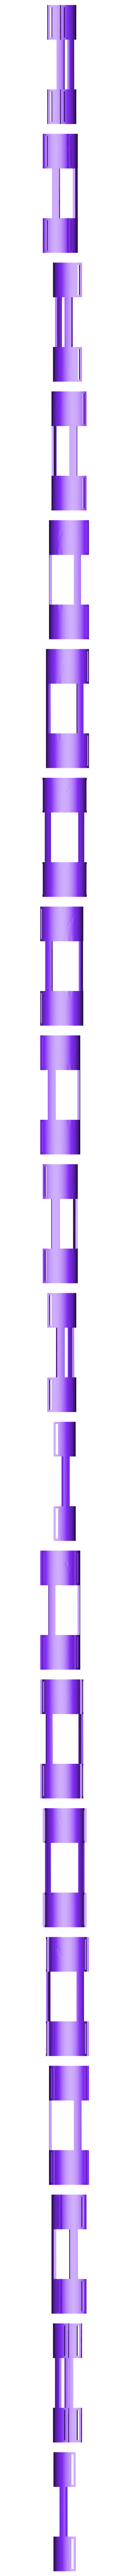 Wrist_mount_part.stl Download free STL file iPad  wrist mount • 3D print template, Fricis